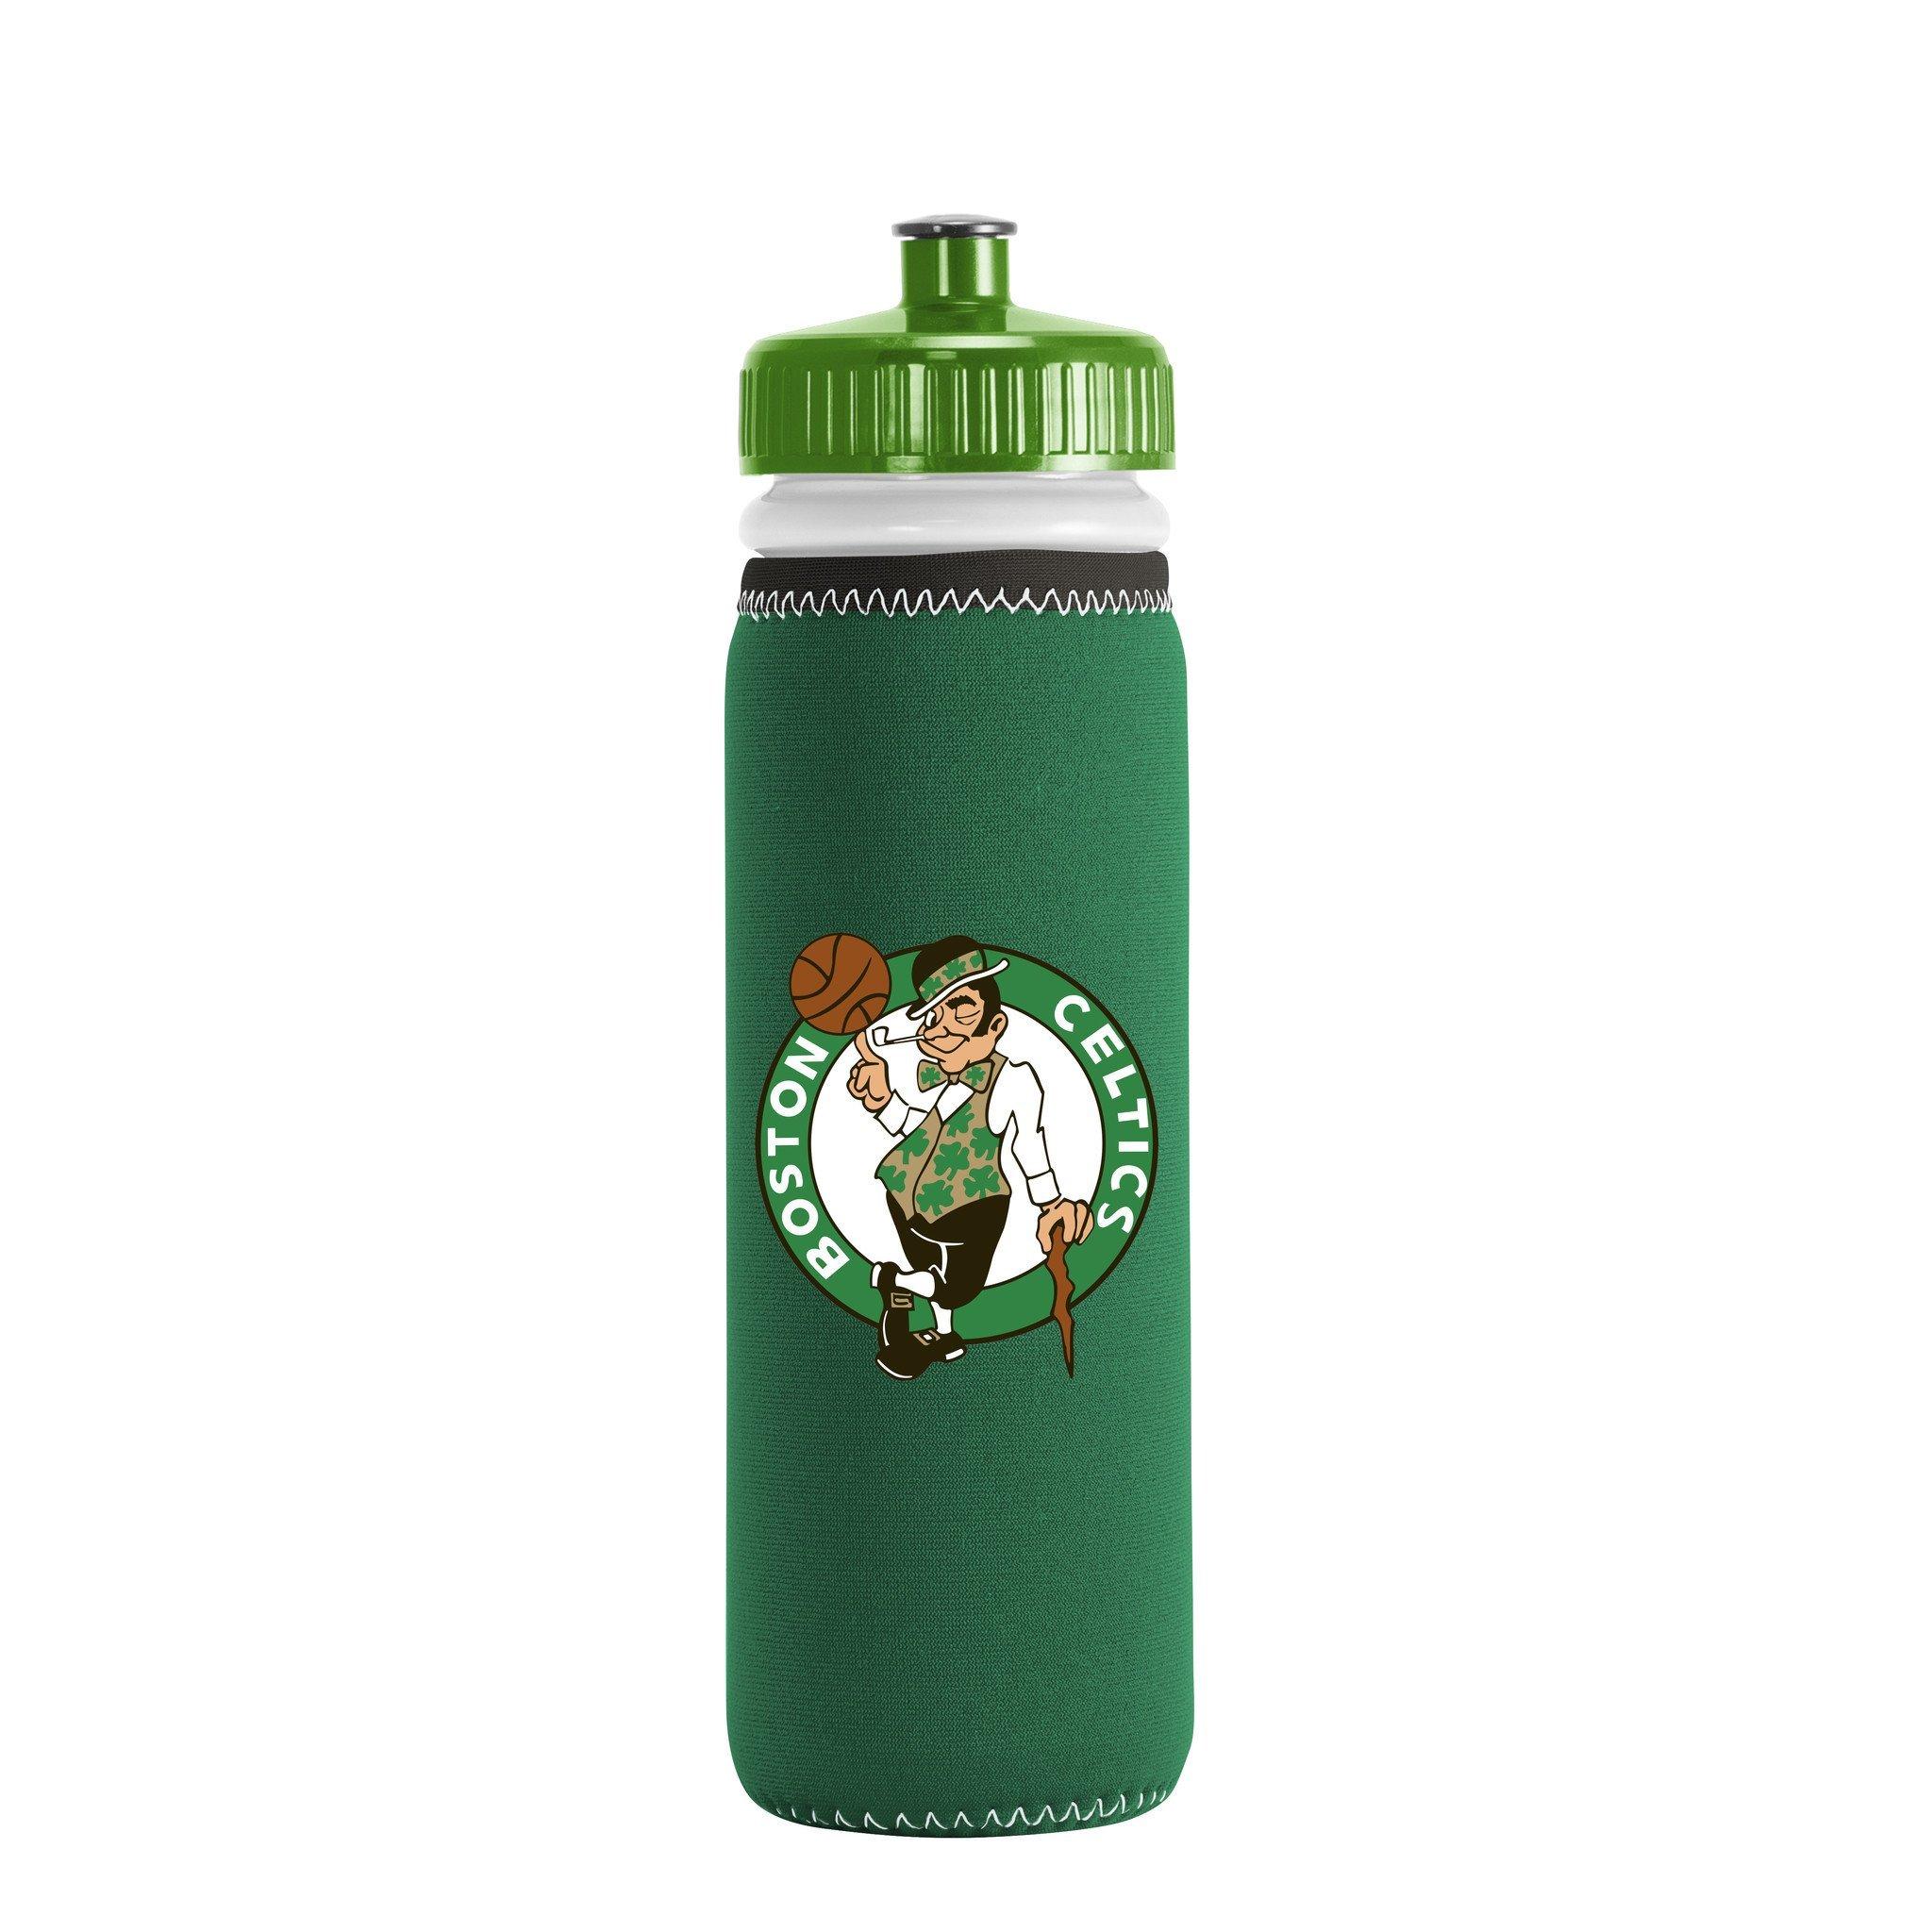 NBA Boston Celtics Van Metro Water Bottle, One Size, Green by Kolder